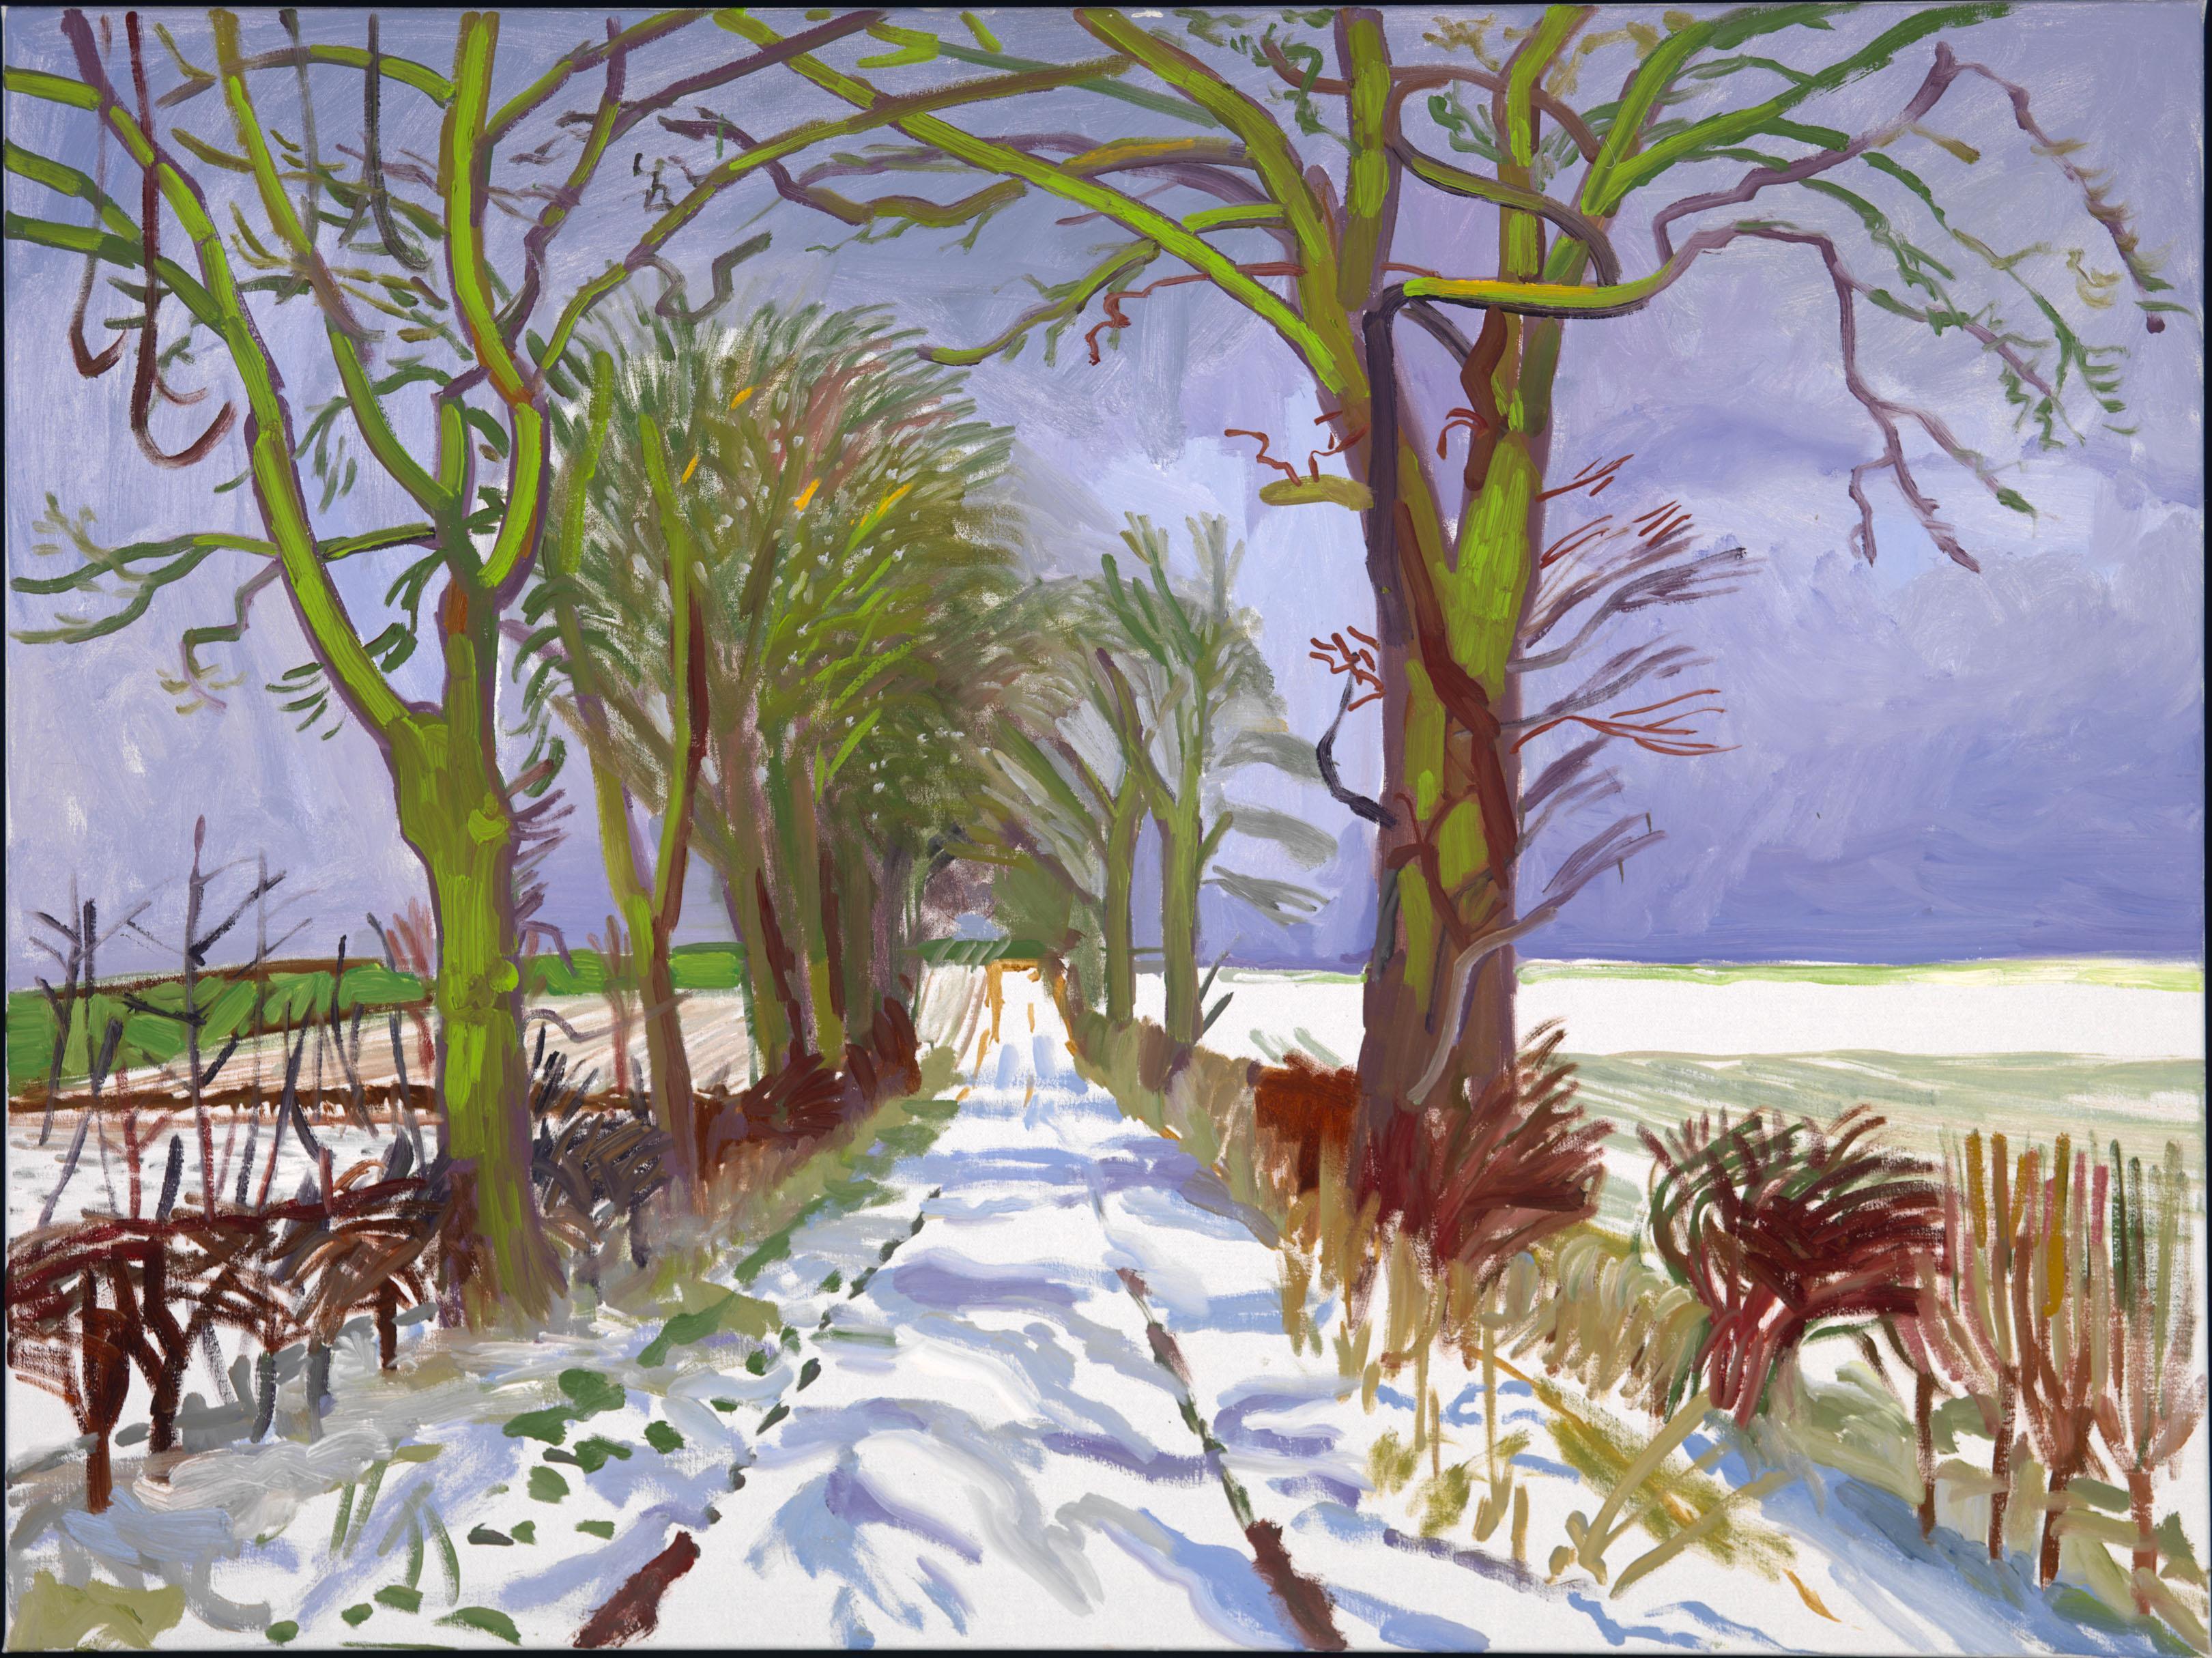 Guggenheim museum bilbao david hockney a bigger picture for David hockney painting